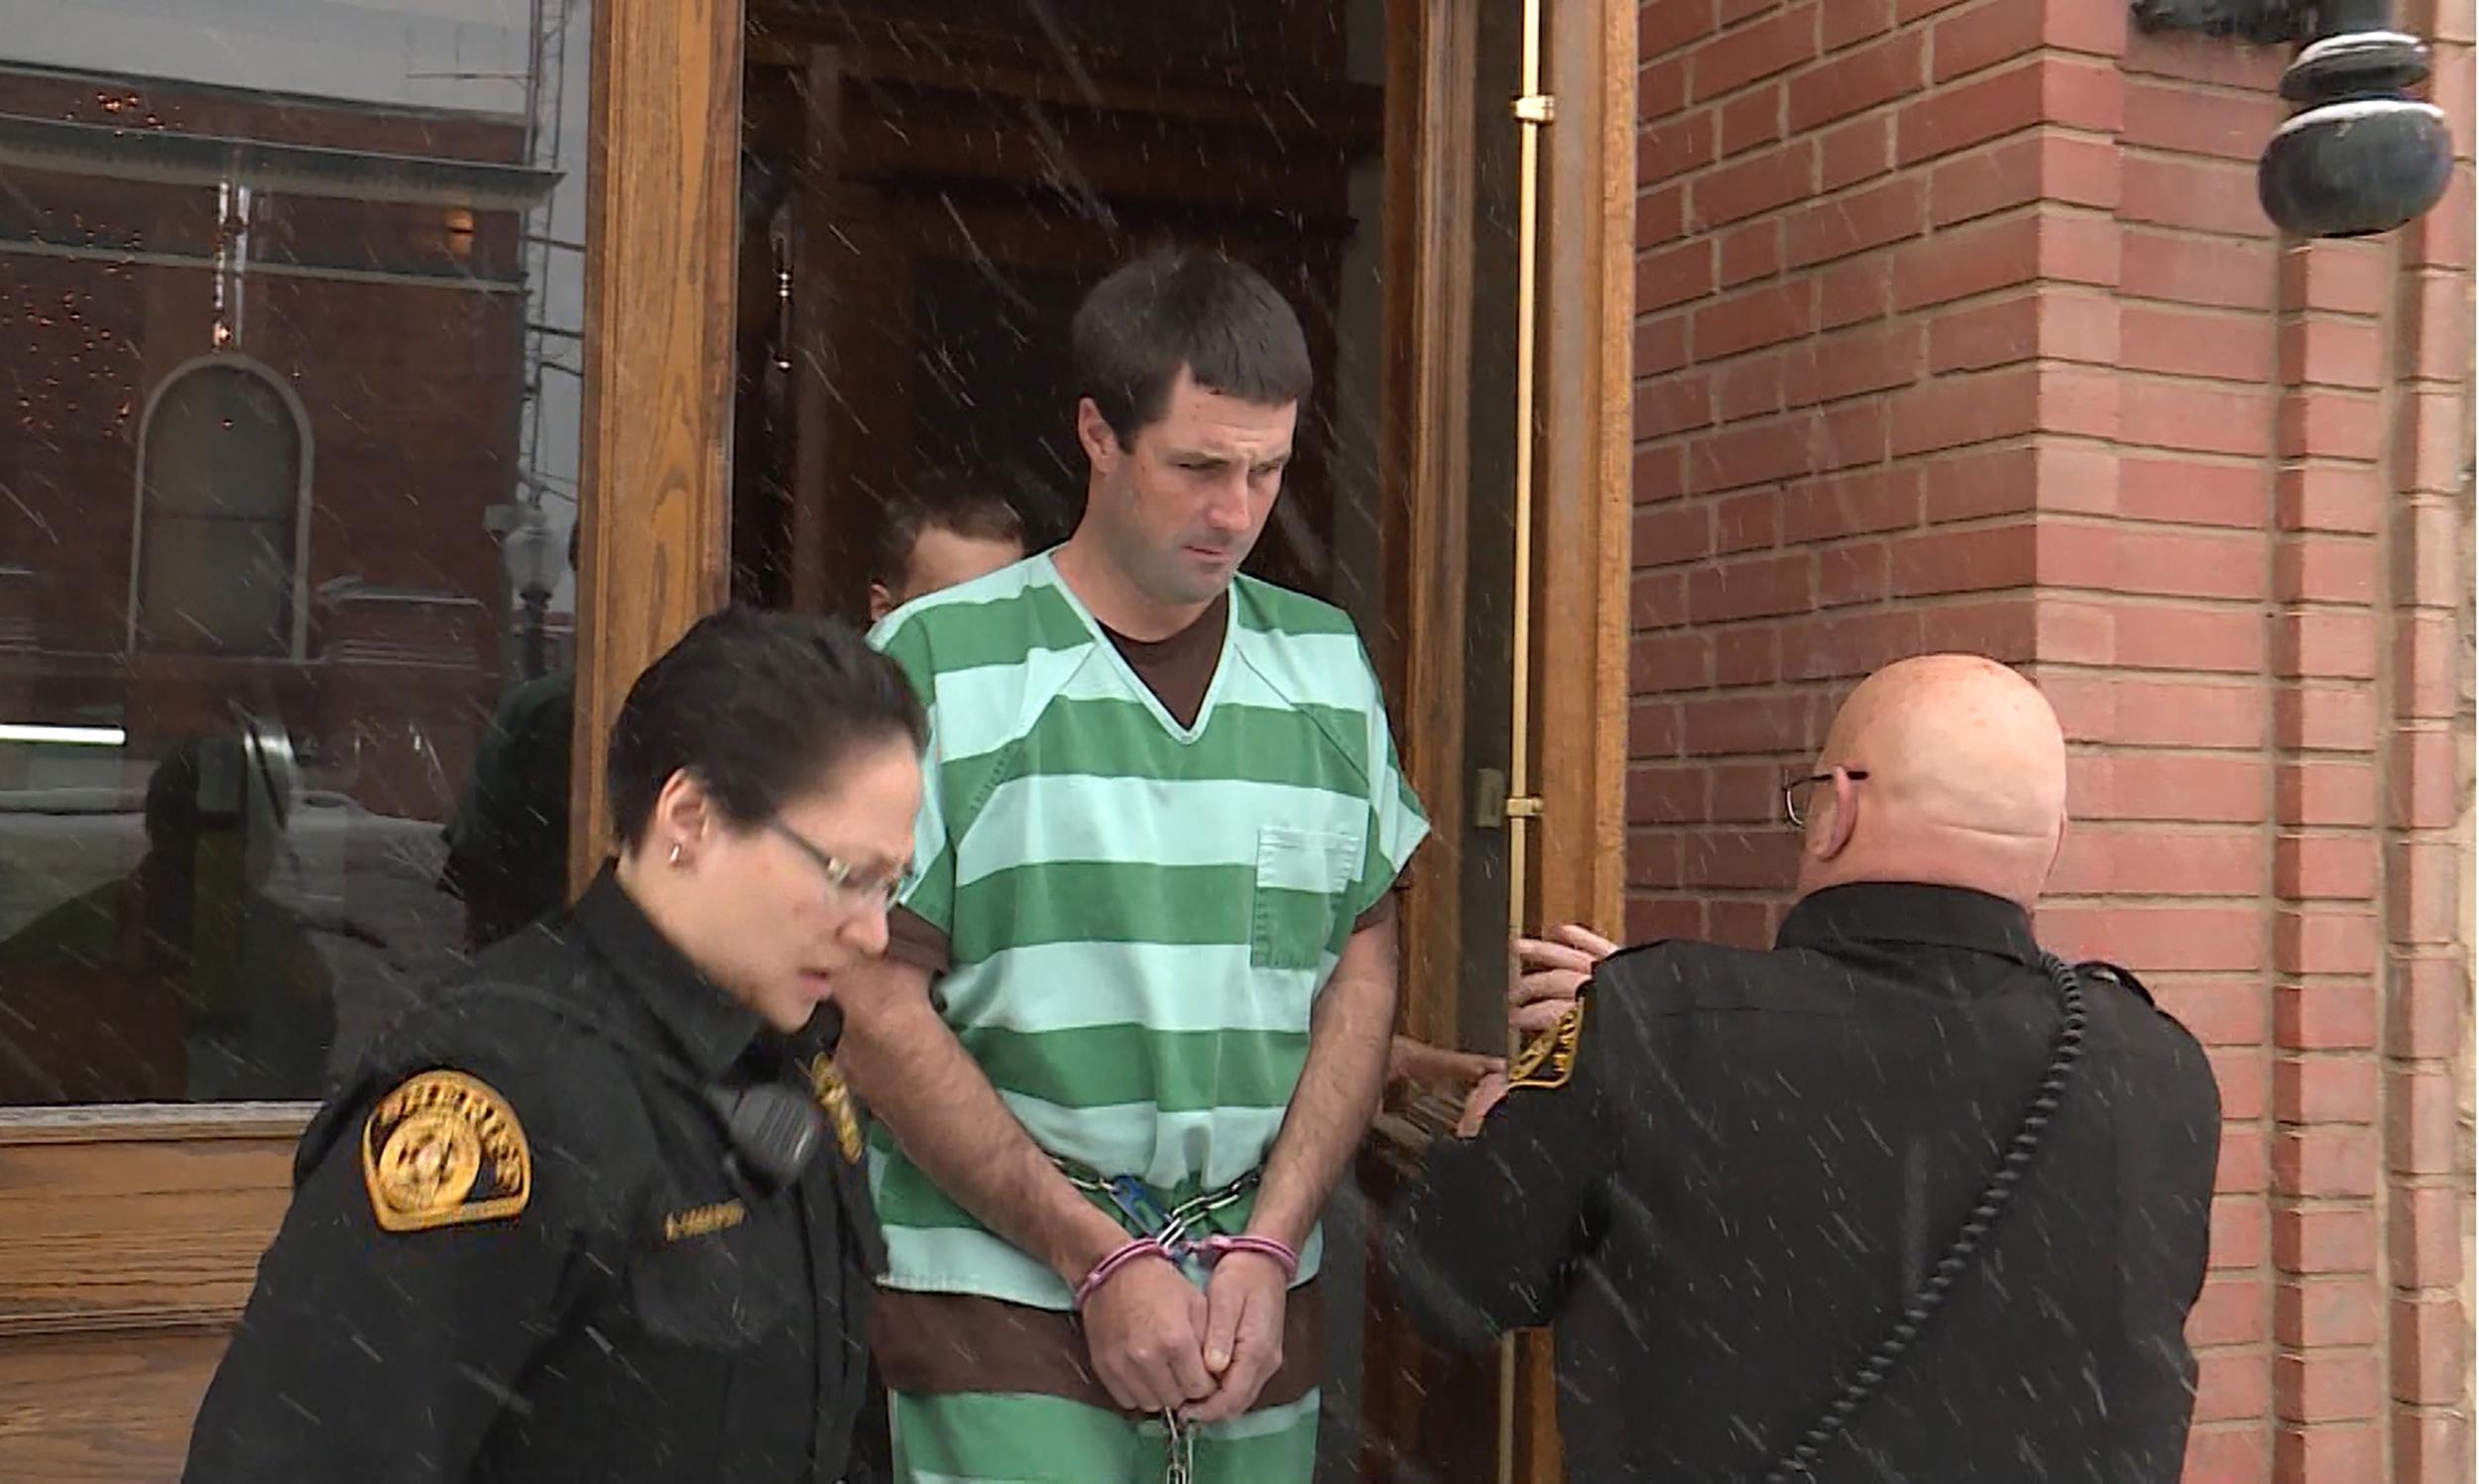 Patrick-Frazee-planning-to-blame-girlfriend-for-Kelsey-Berreth's-murder